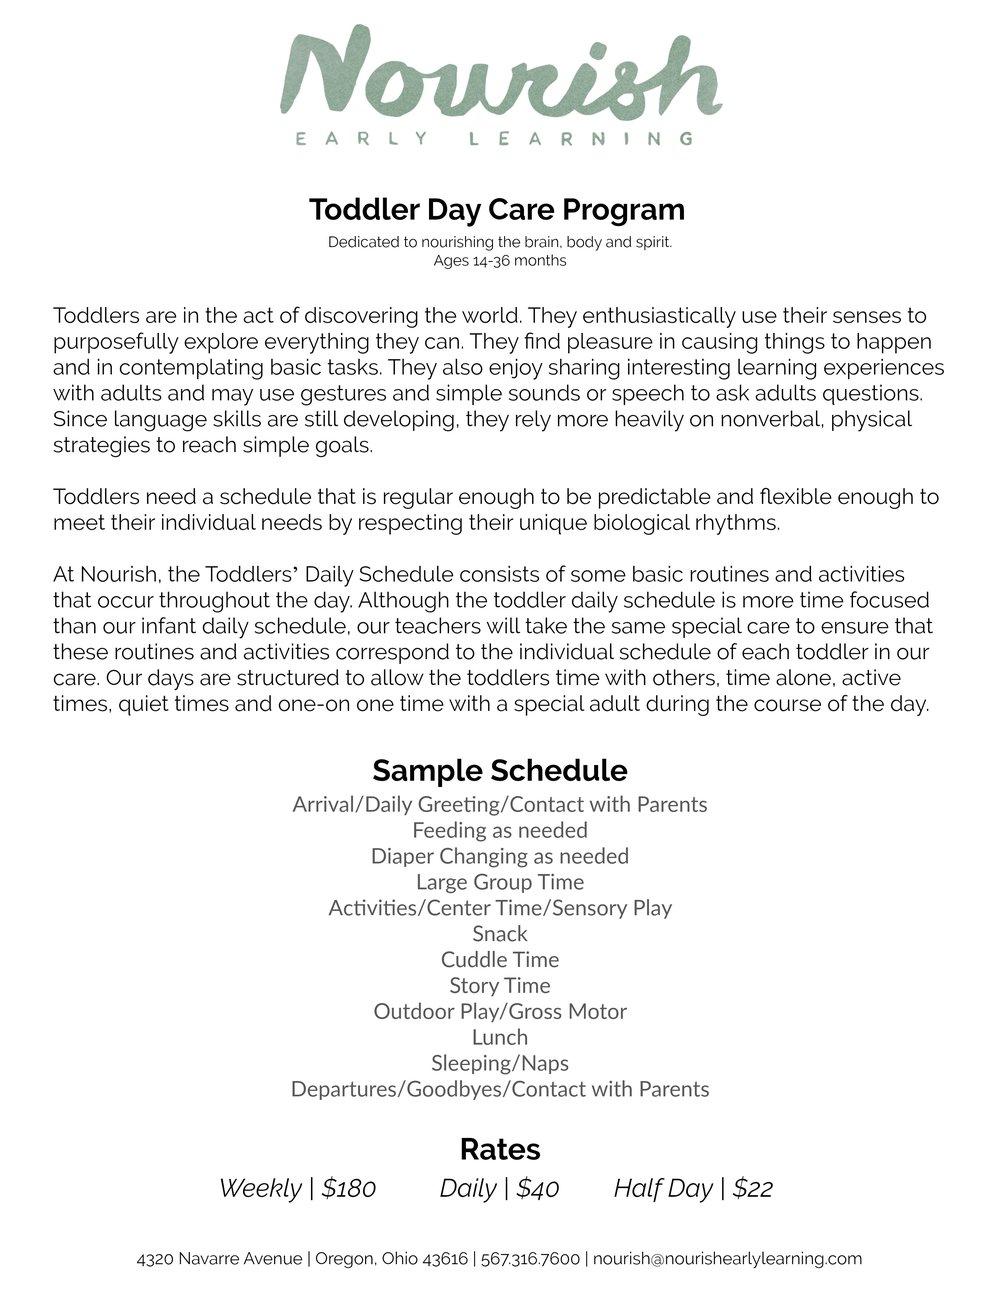 Program Overview Nourish